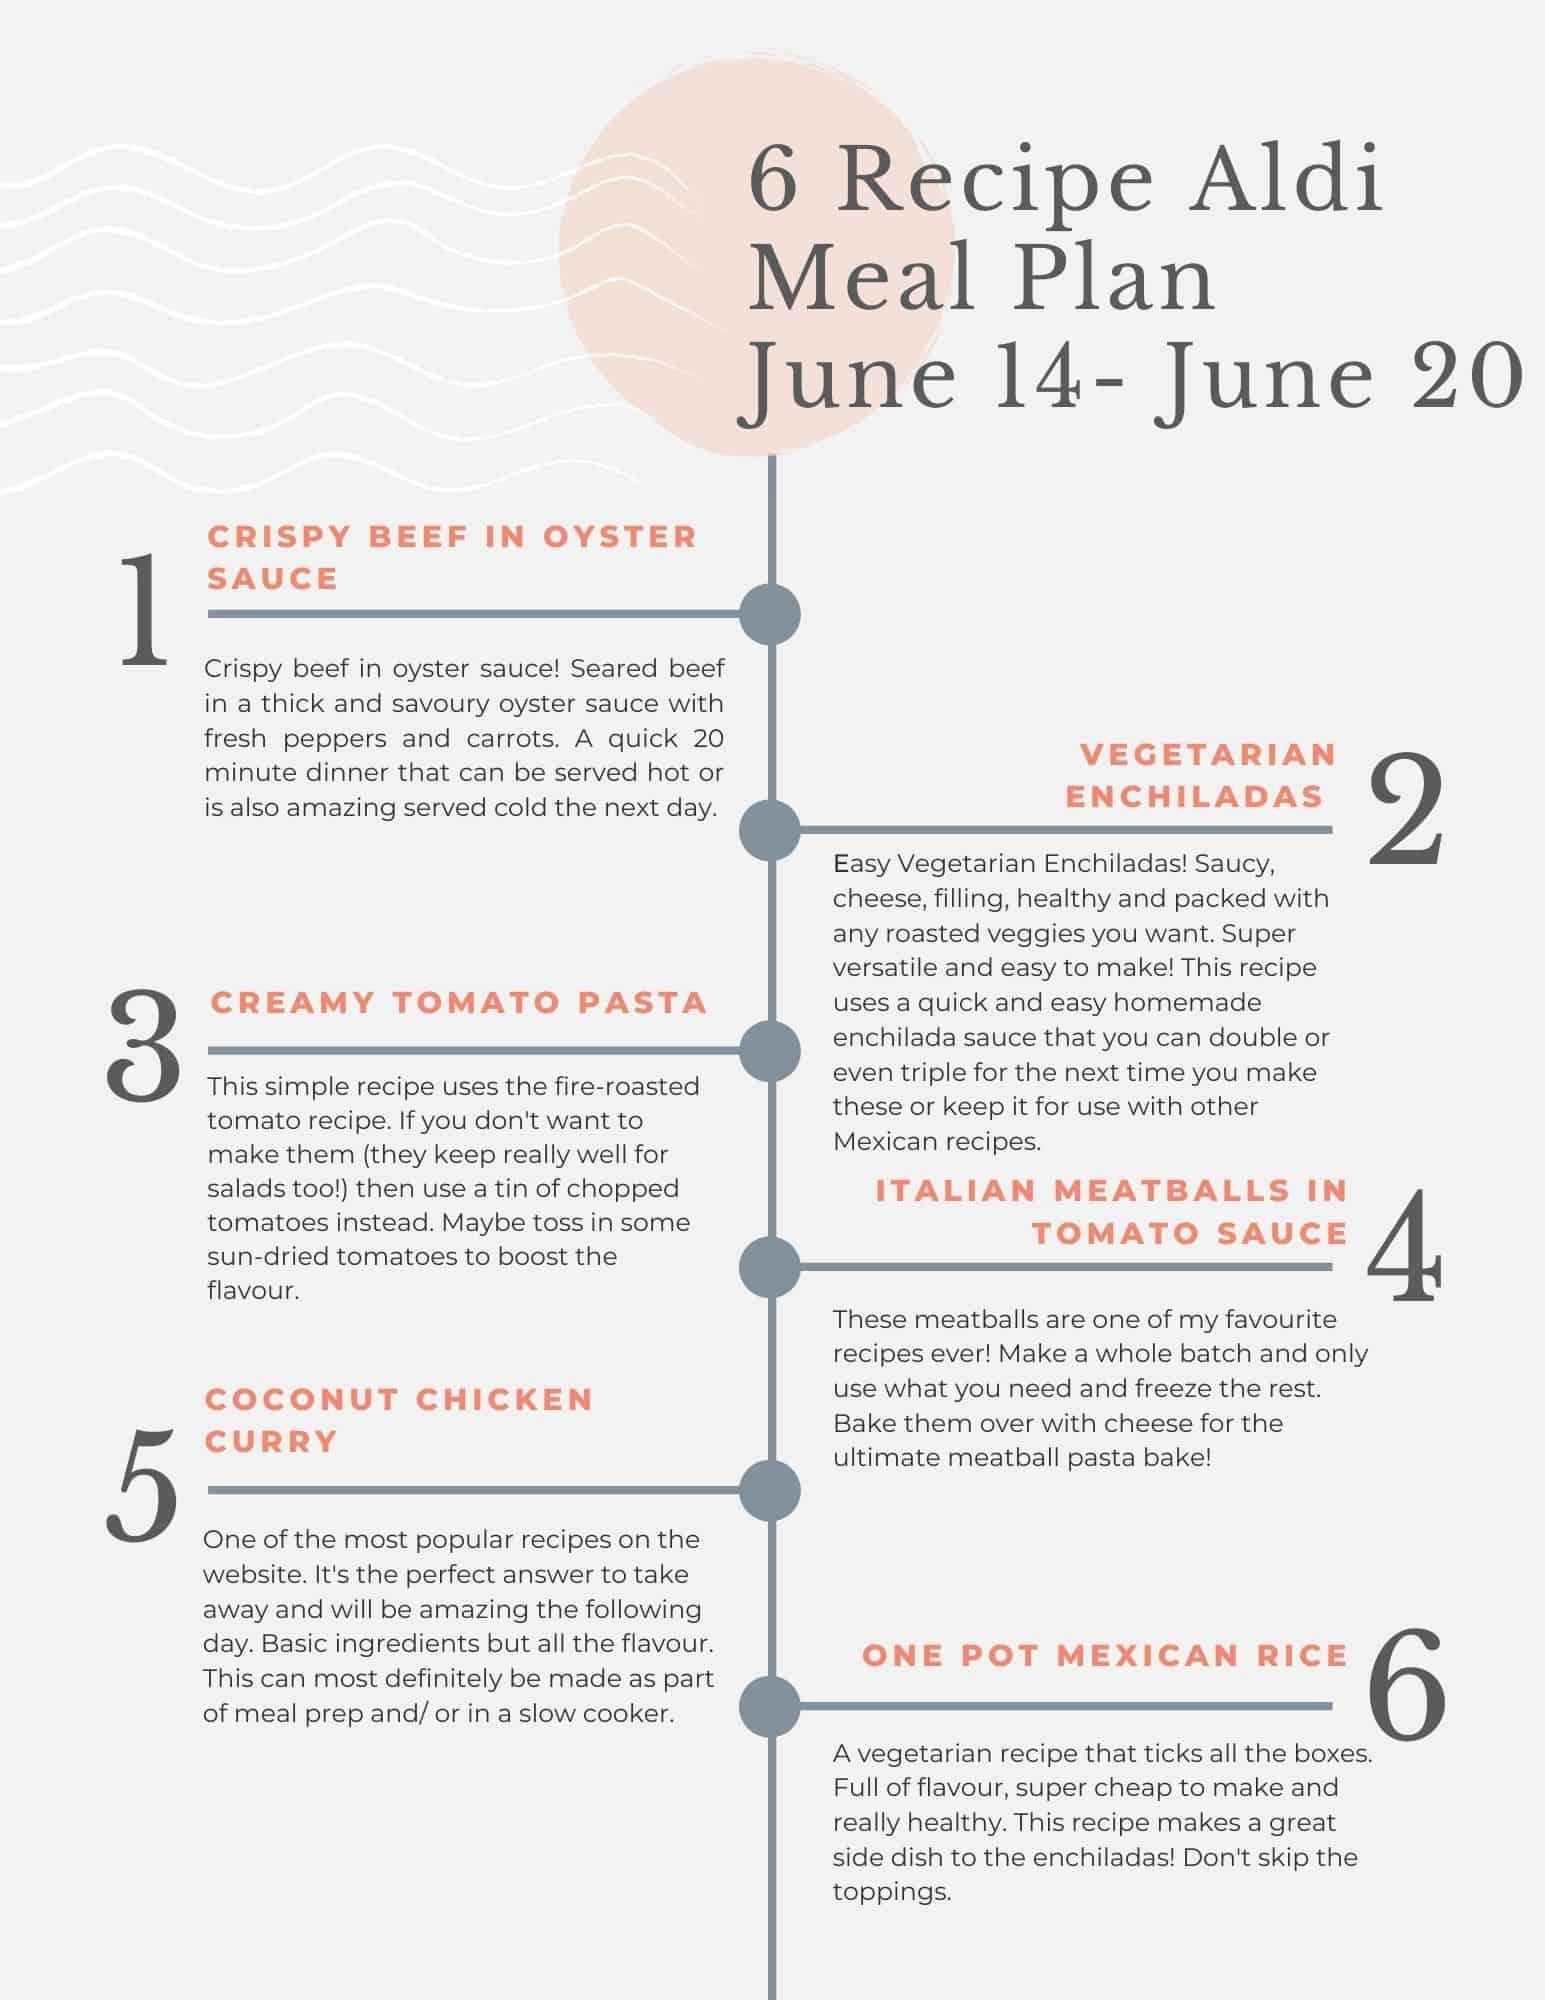 Aldi budget meal plan tip sheet. Budget recipes